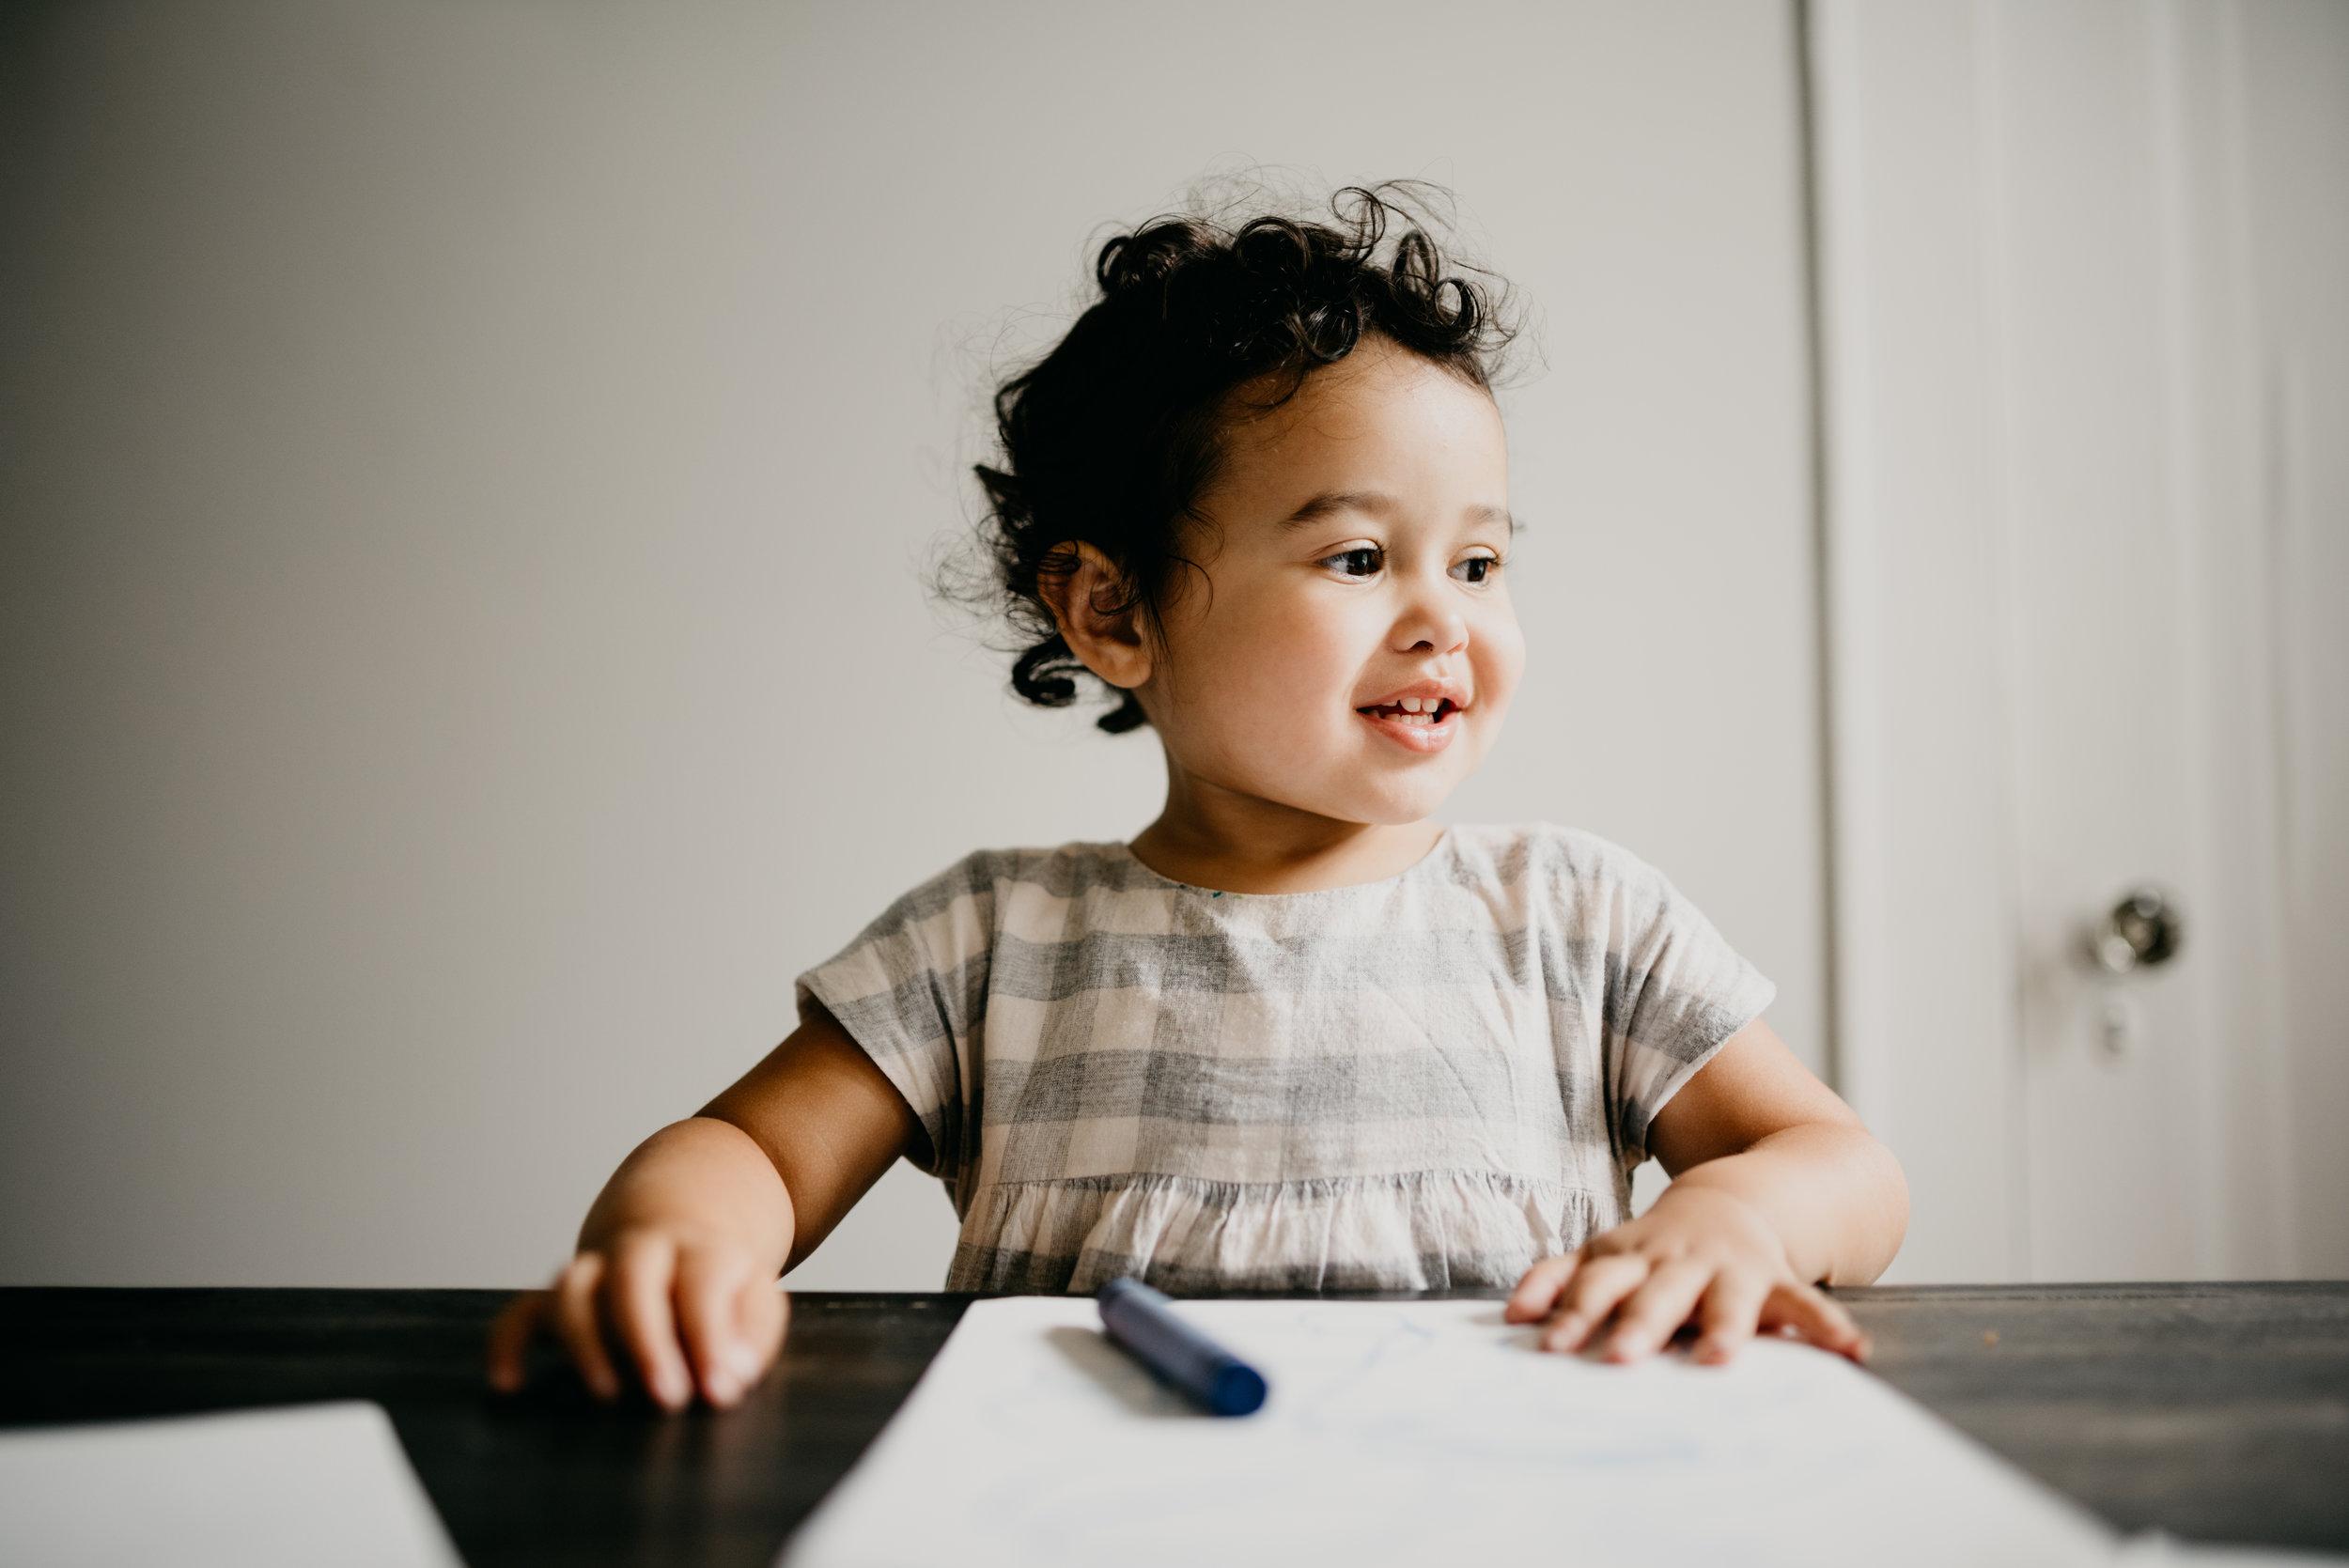 Ehrman-Massachusetts-In Home Lifestyle Maternity Session-Documentary Family Photographer-763.jpg